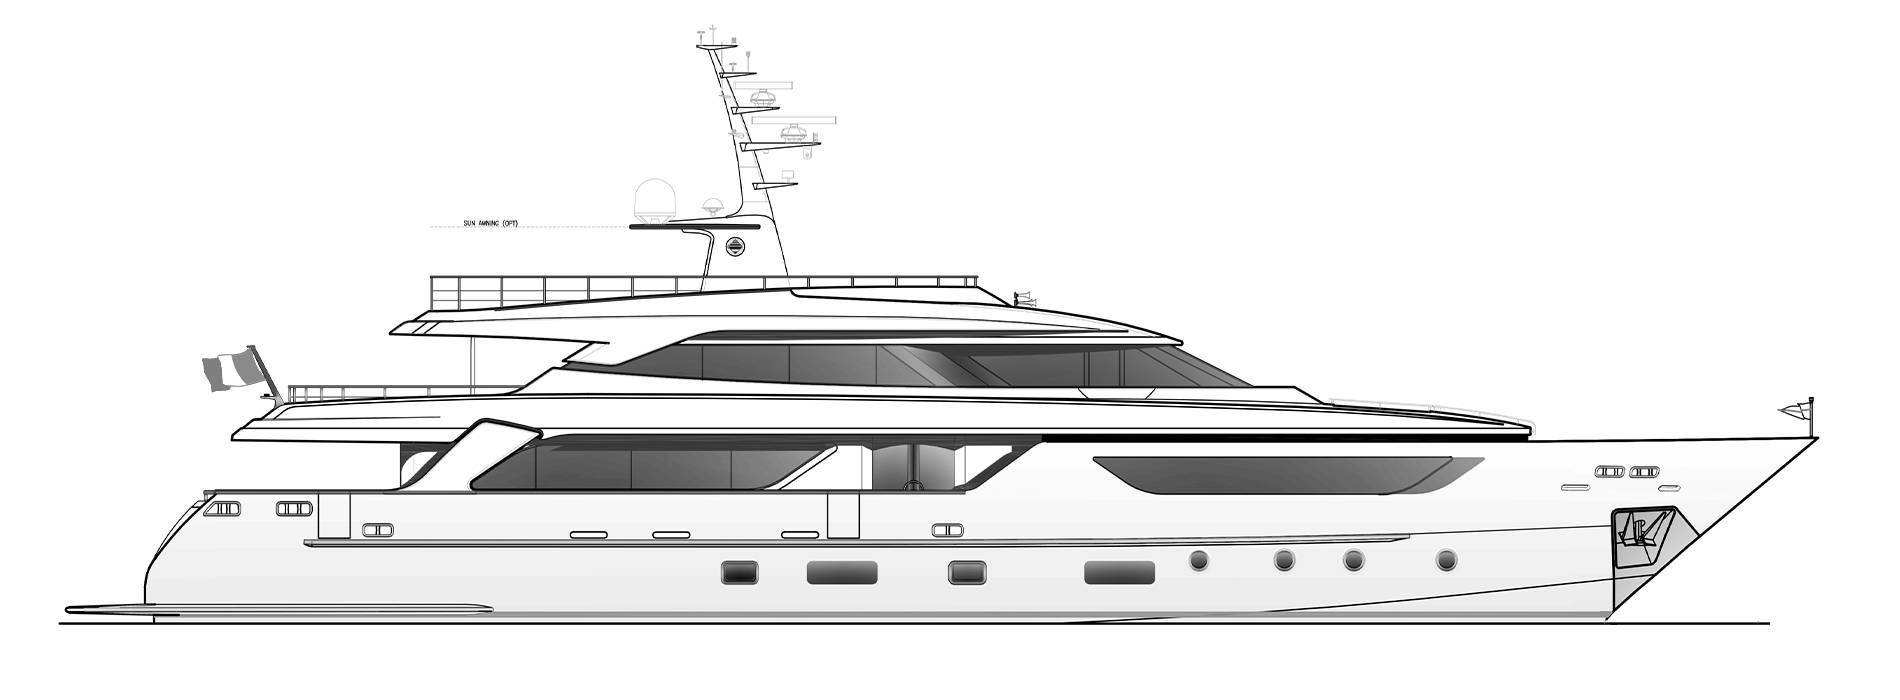 Sanlorenzo Yachts SD122-27 under offer Perfil